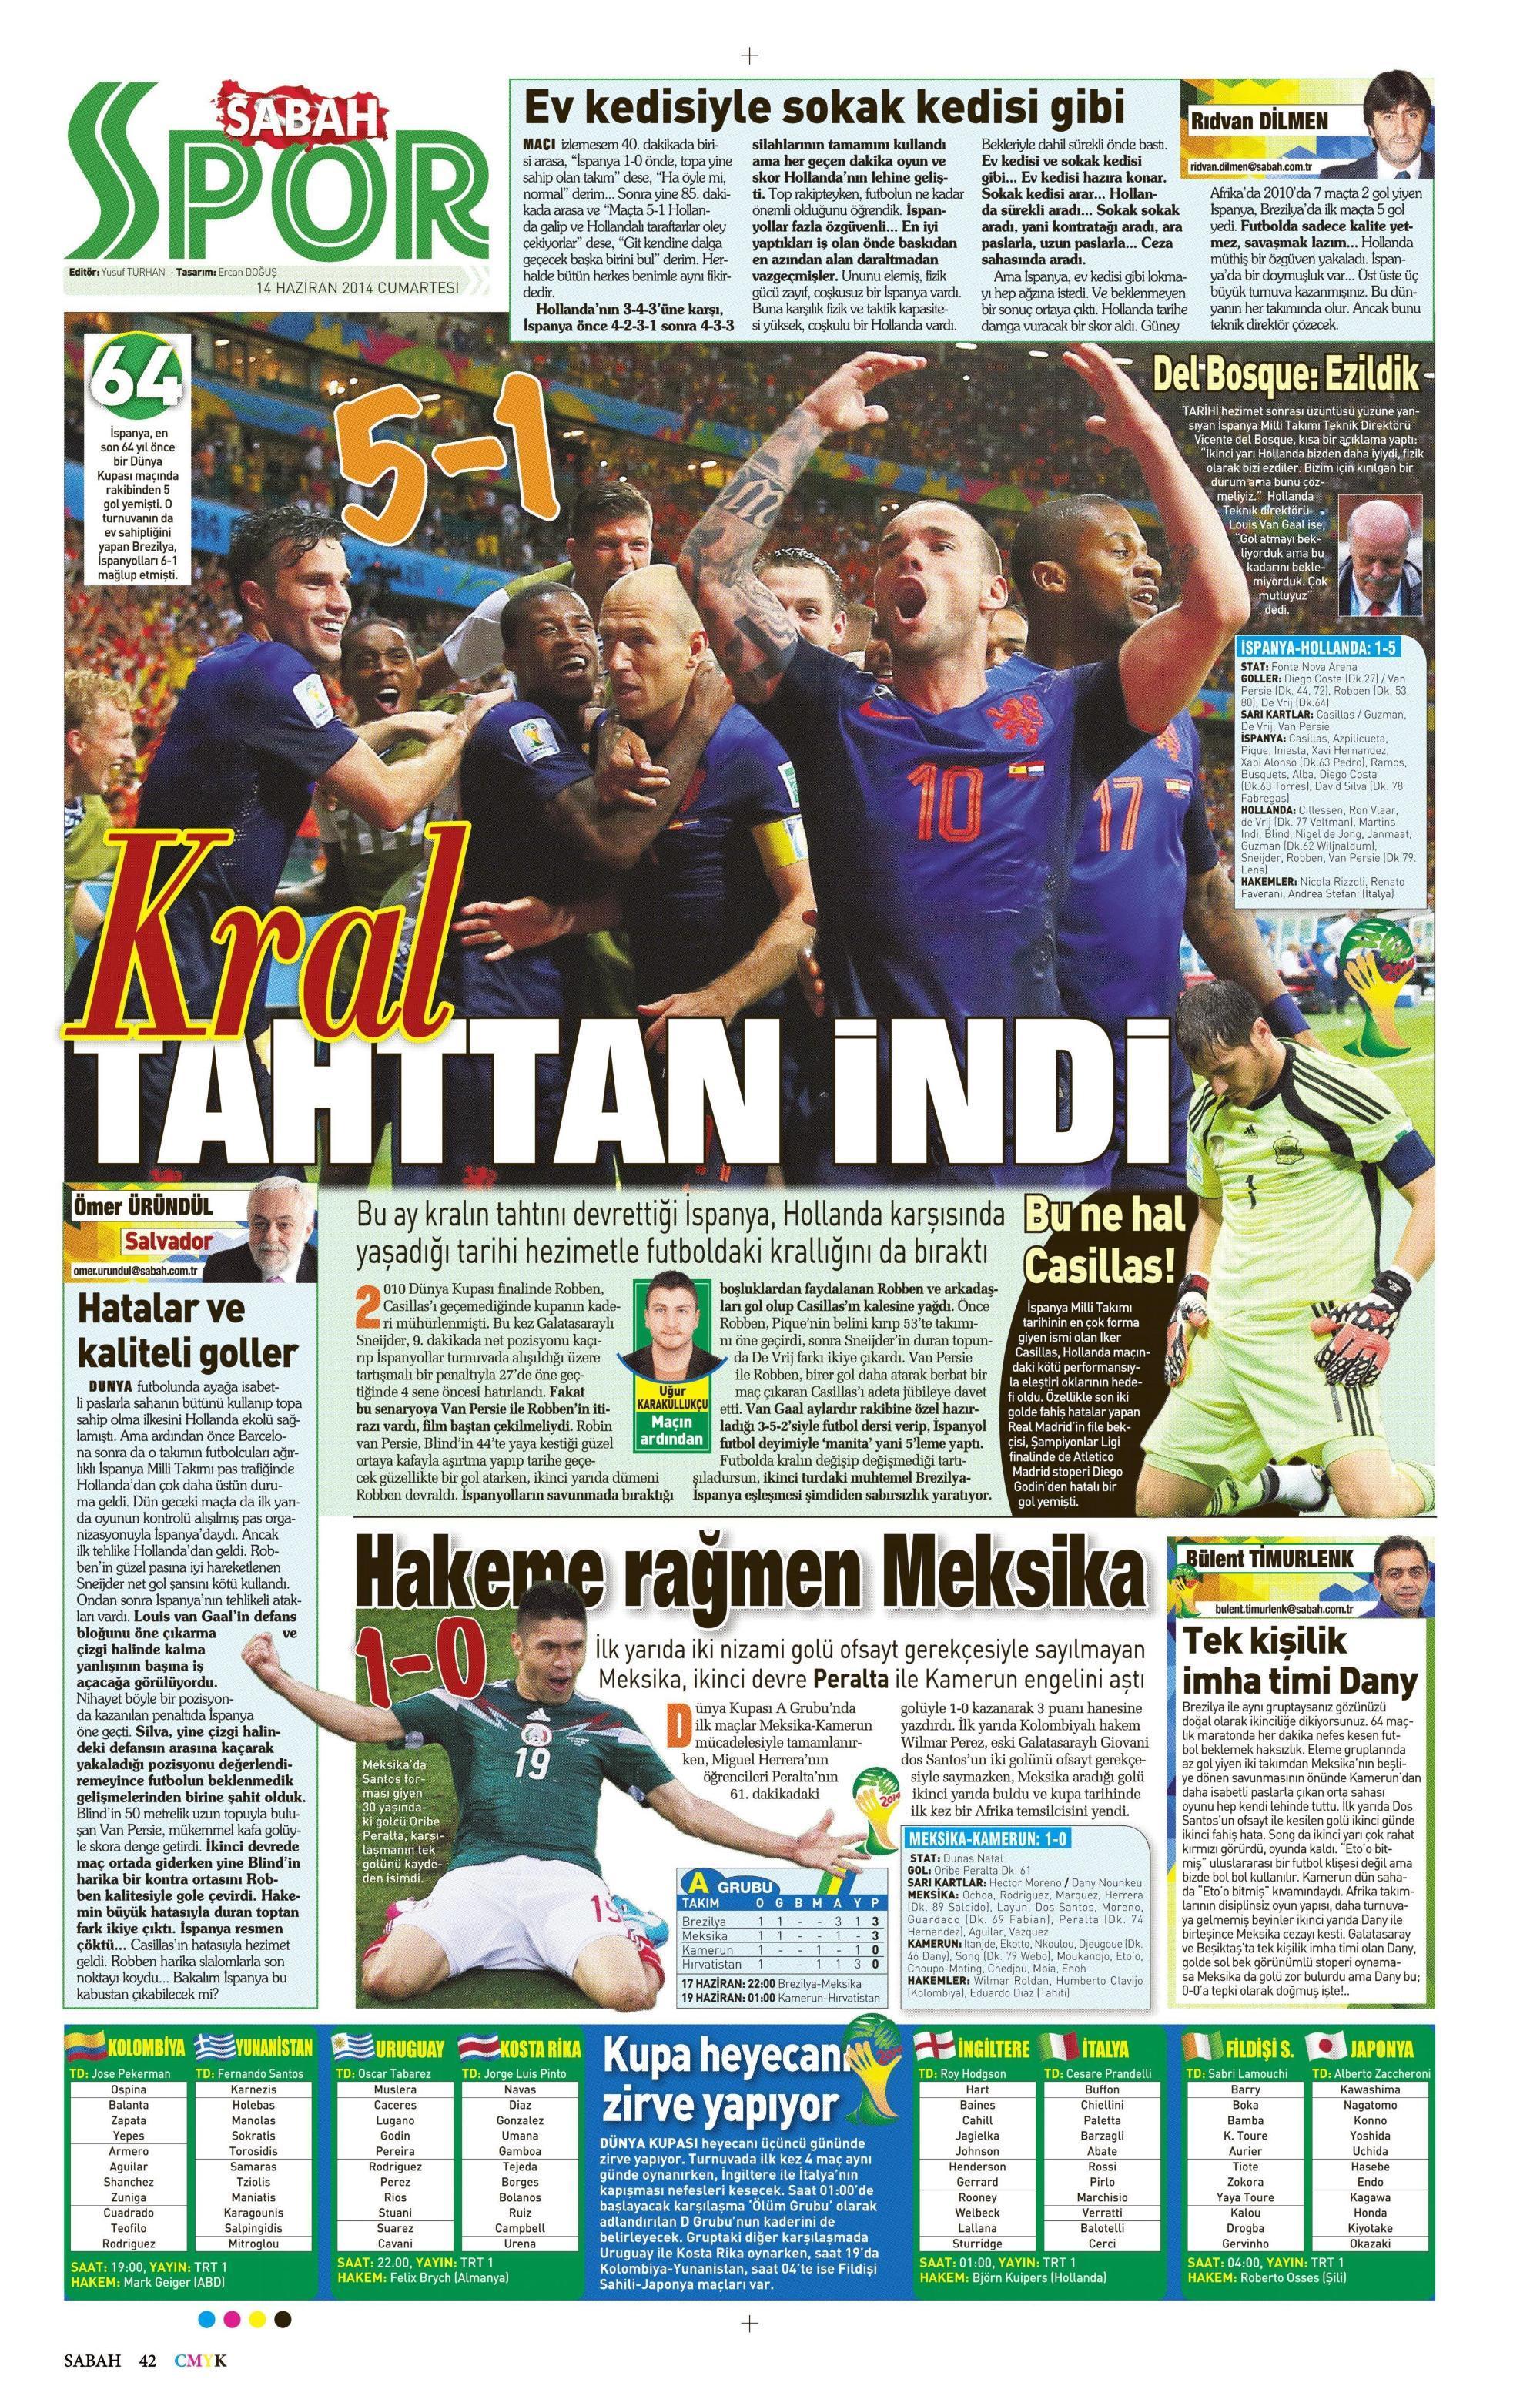 Sporun Manşetleri   14 Haziran 2014 - onedio com